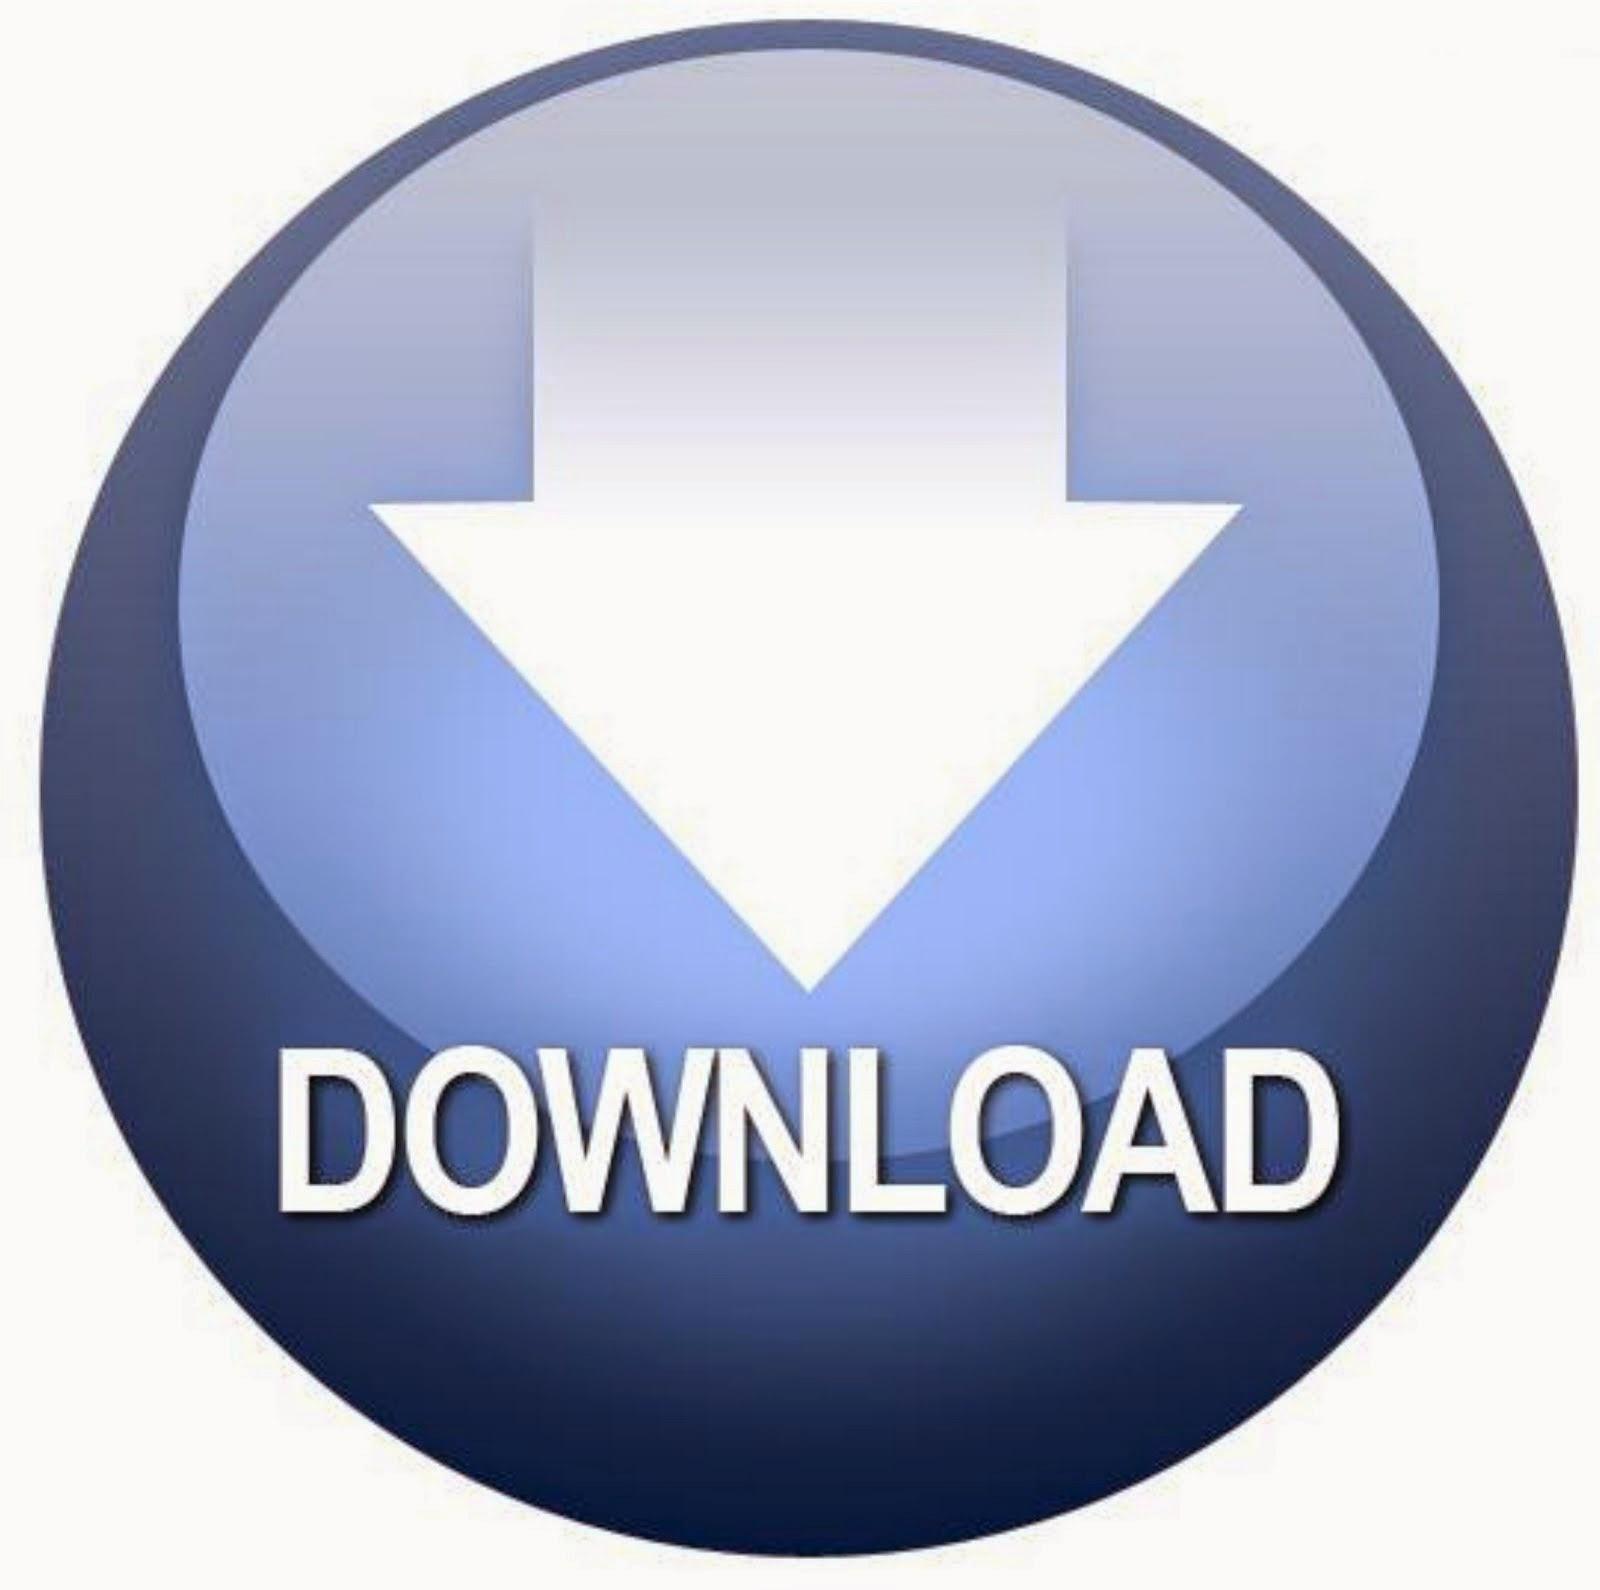 http://www.mediafire.com/download/bv66h0neqnoncfd/Clovis+batebola+-+Descriminaliza%C3%A7%C3%A3o+da+pobreza+-+Volume+01.rar